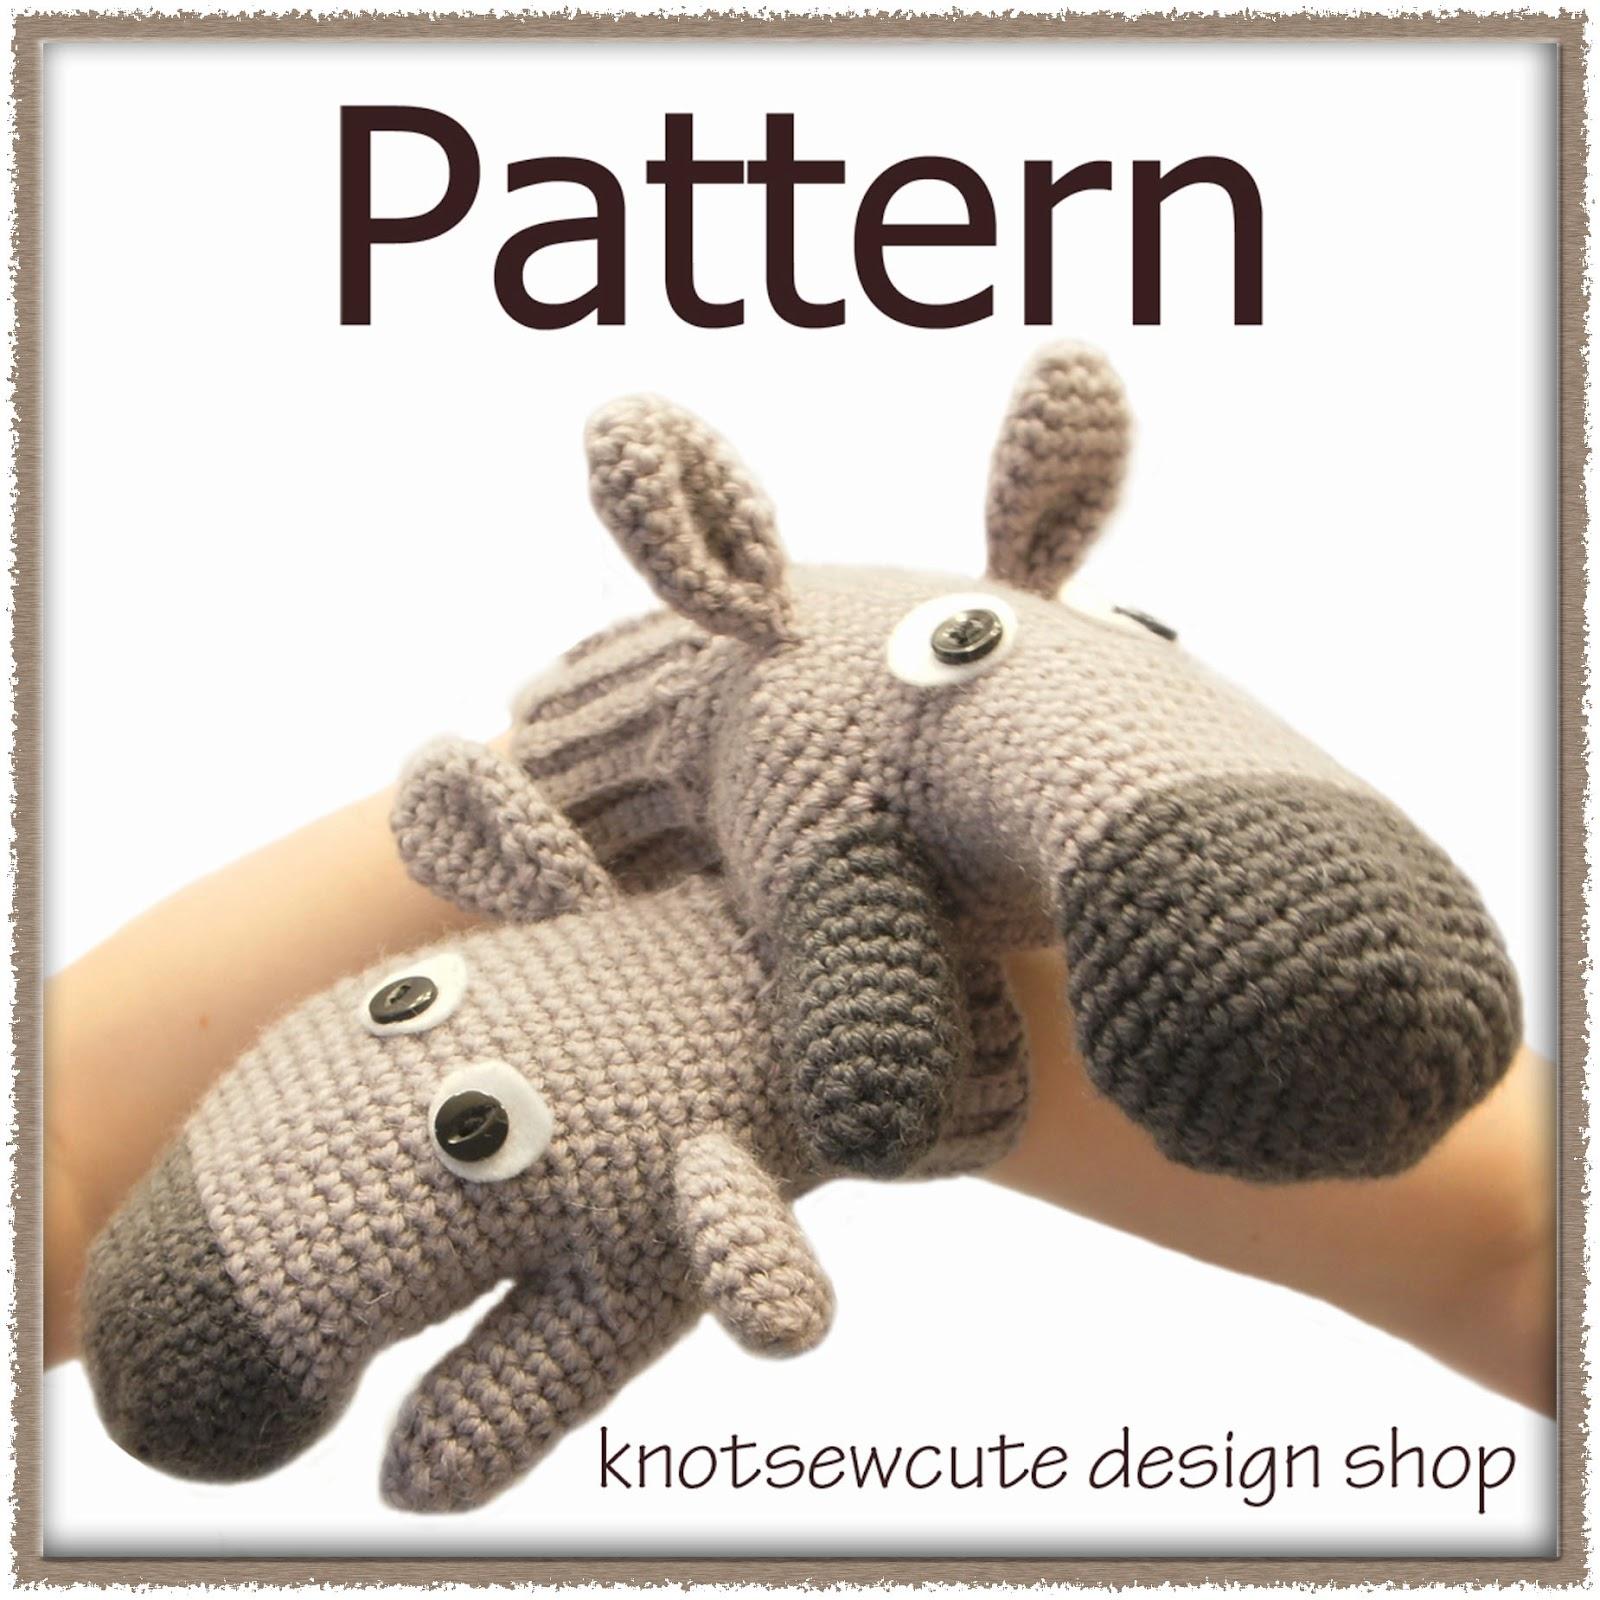 knot sew cute design shop: new crochet pattern - donkey ...